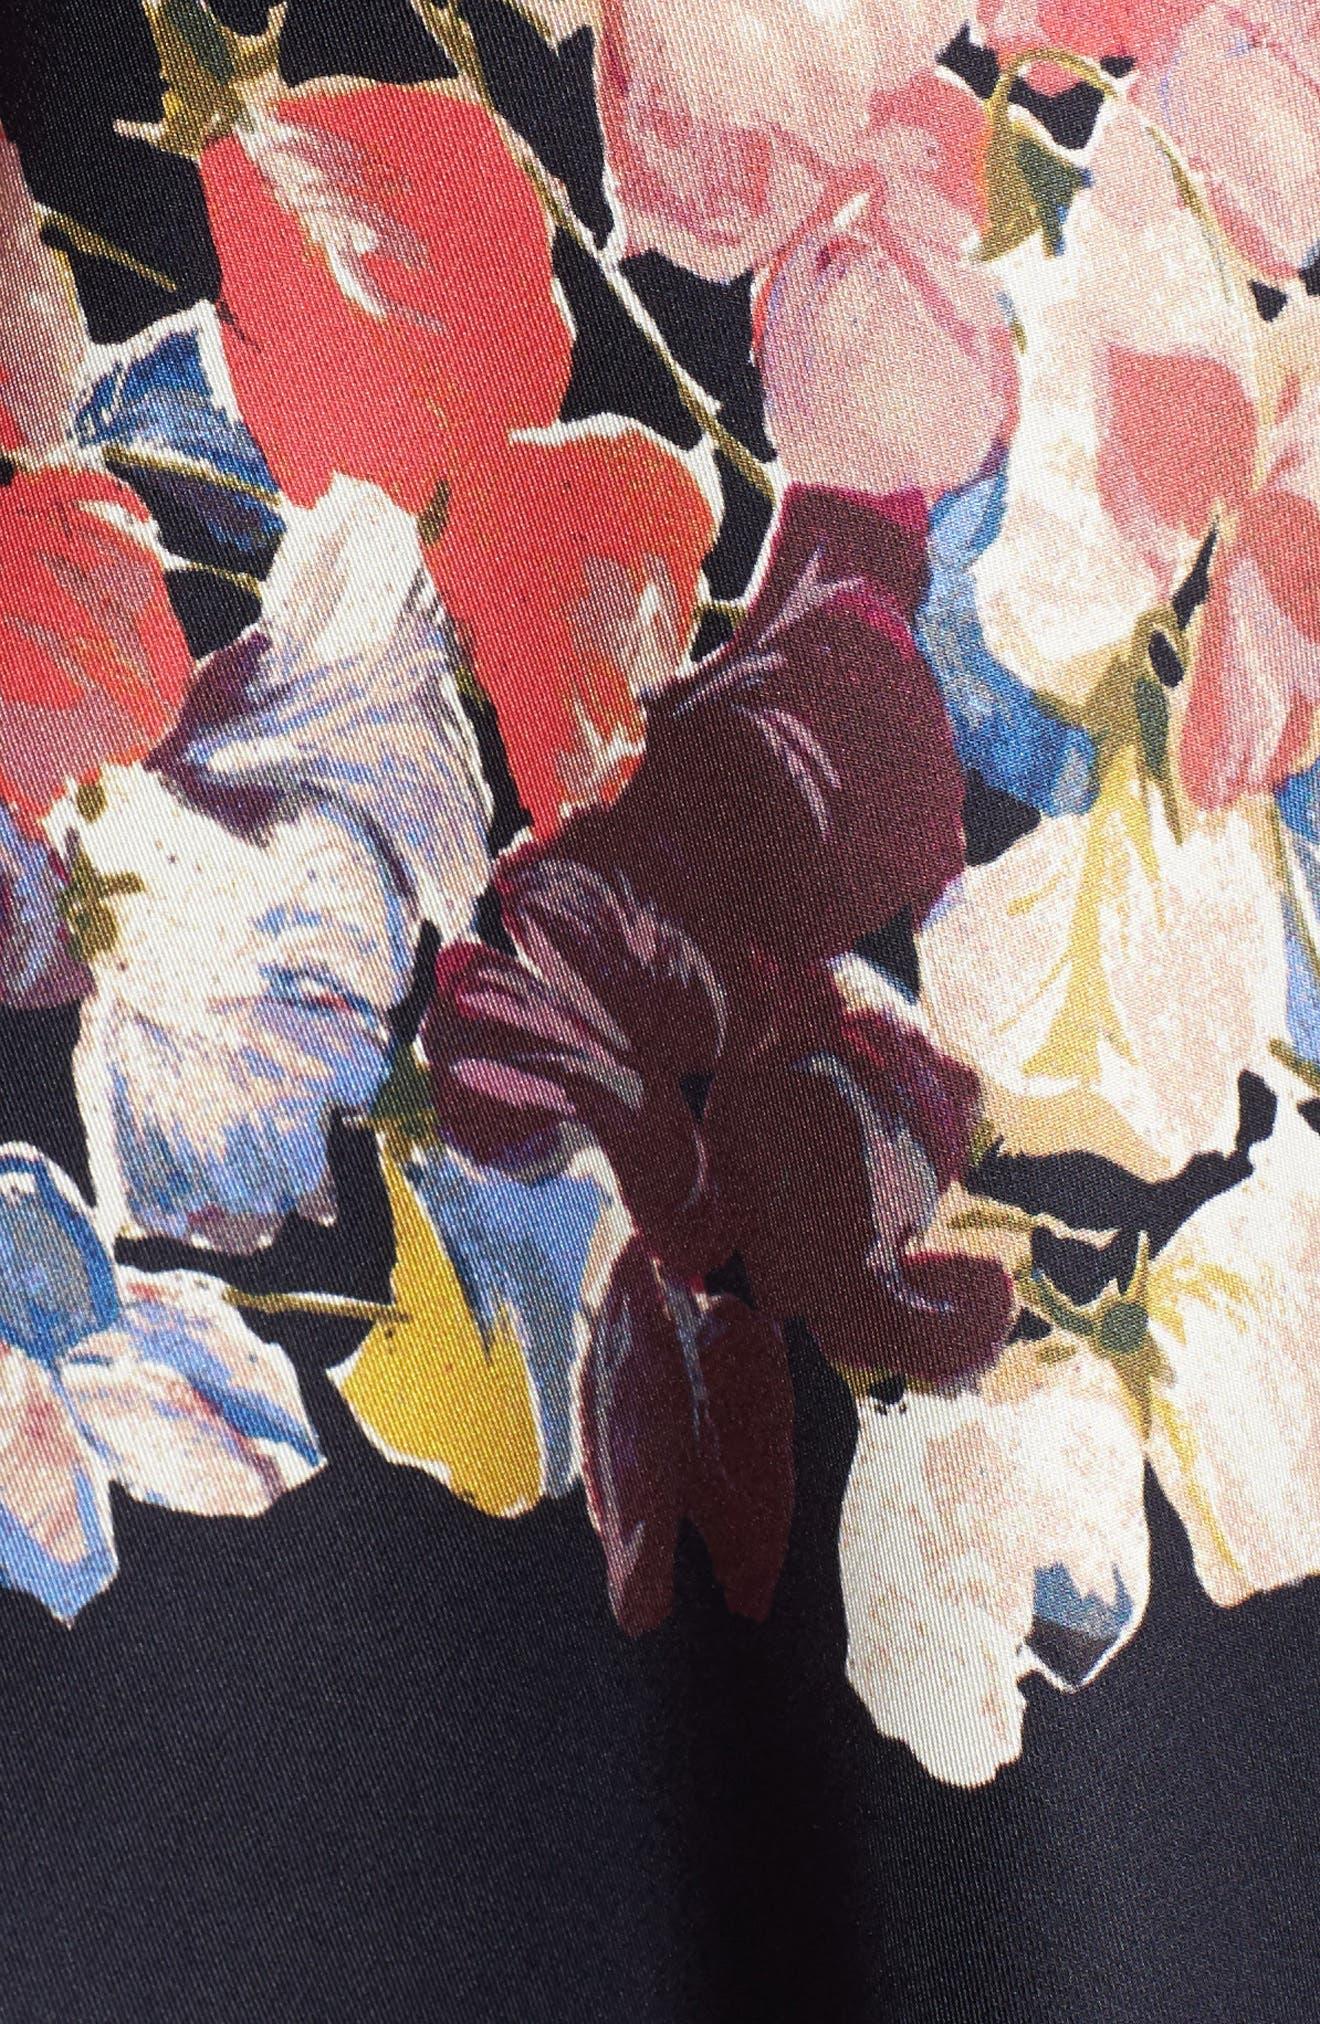 Puffed Sleeve Print Top,                             Alternate thumbnail 6, color,                             NAVY NIGHT SHERIDAN FLORAL